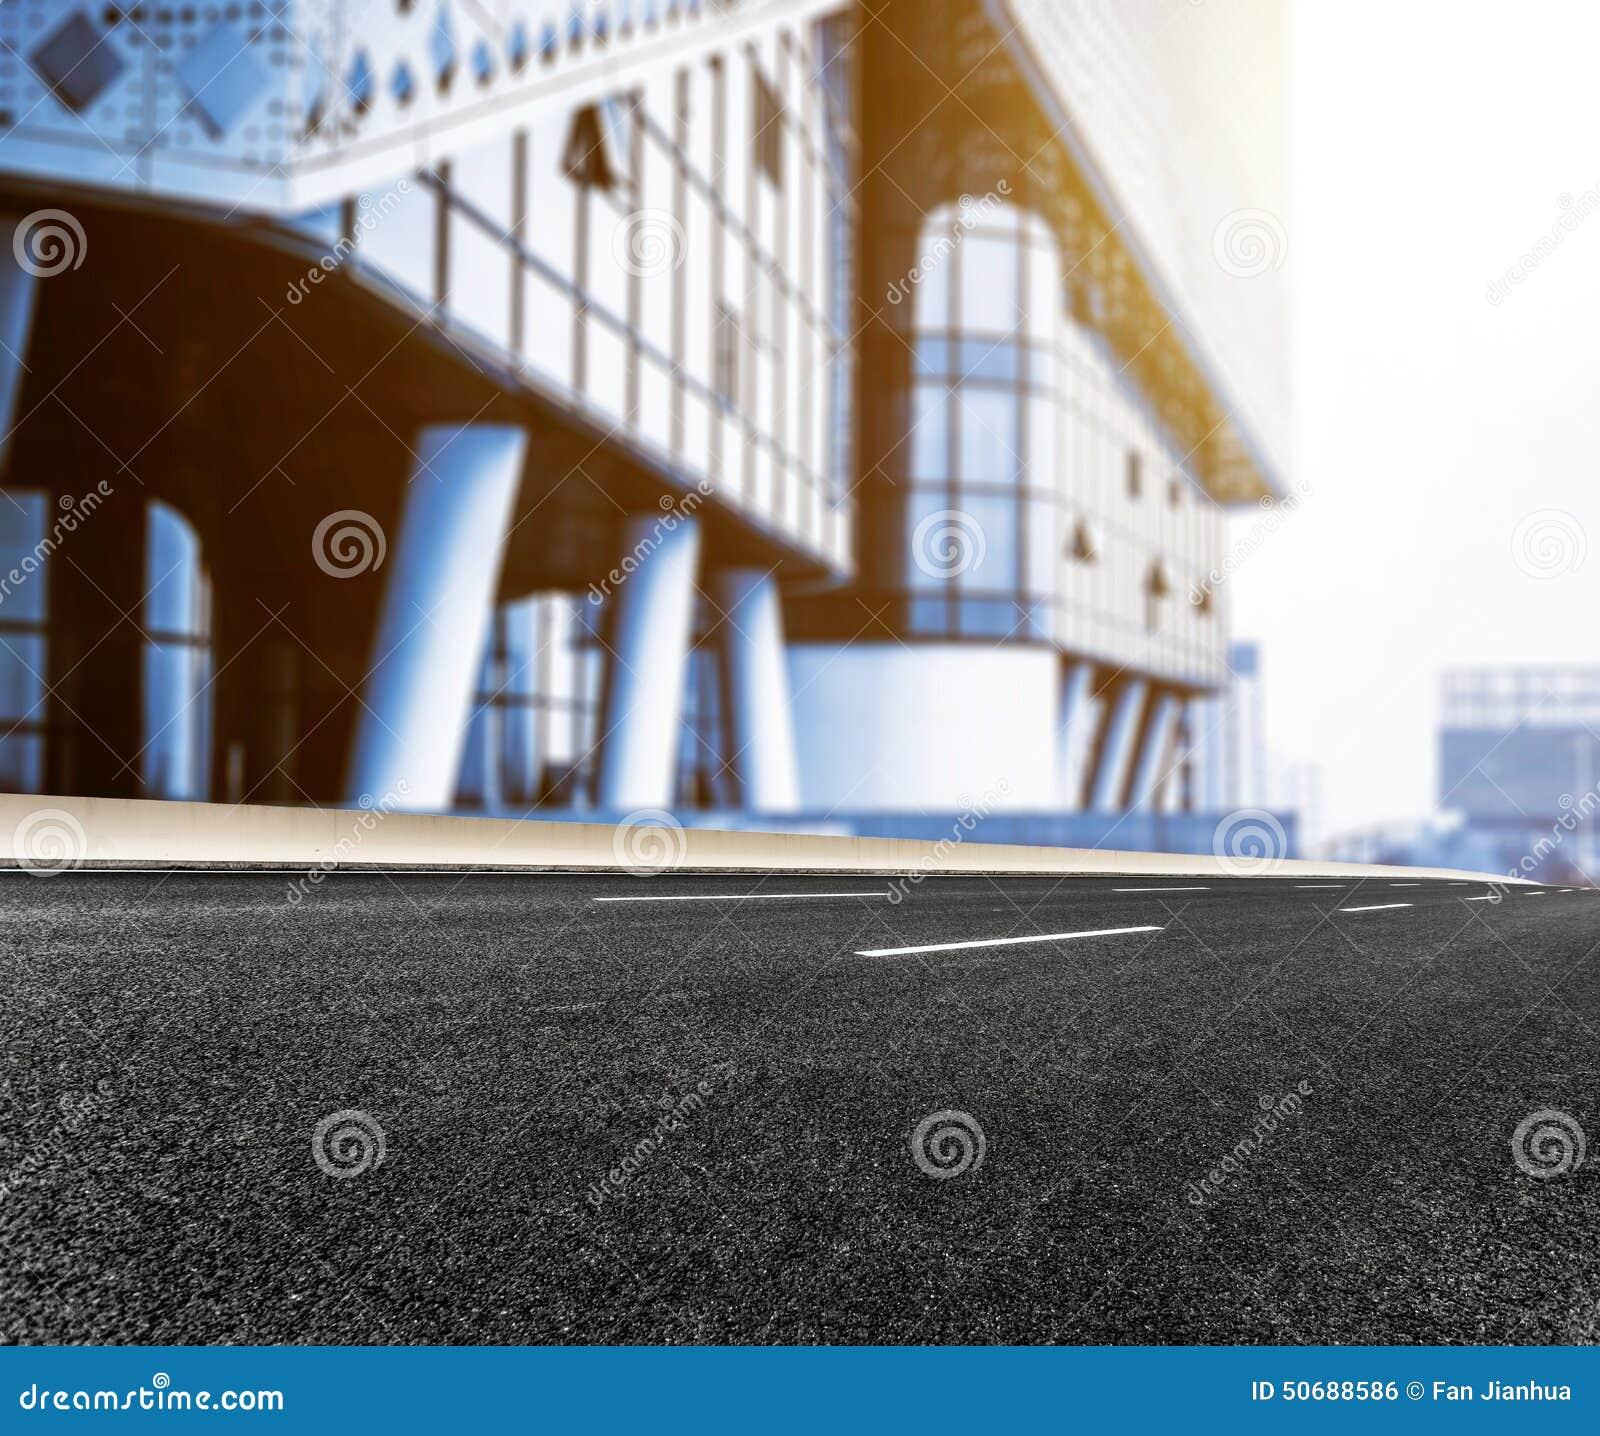 Download 现代建筑学背景和路 库存照片. 图片 包括有 发展, 旅行, 符号, 高速公路, 城市, 堵塞, 繁忙, 行动 - 50688586